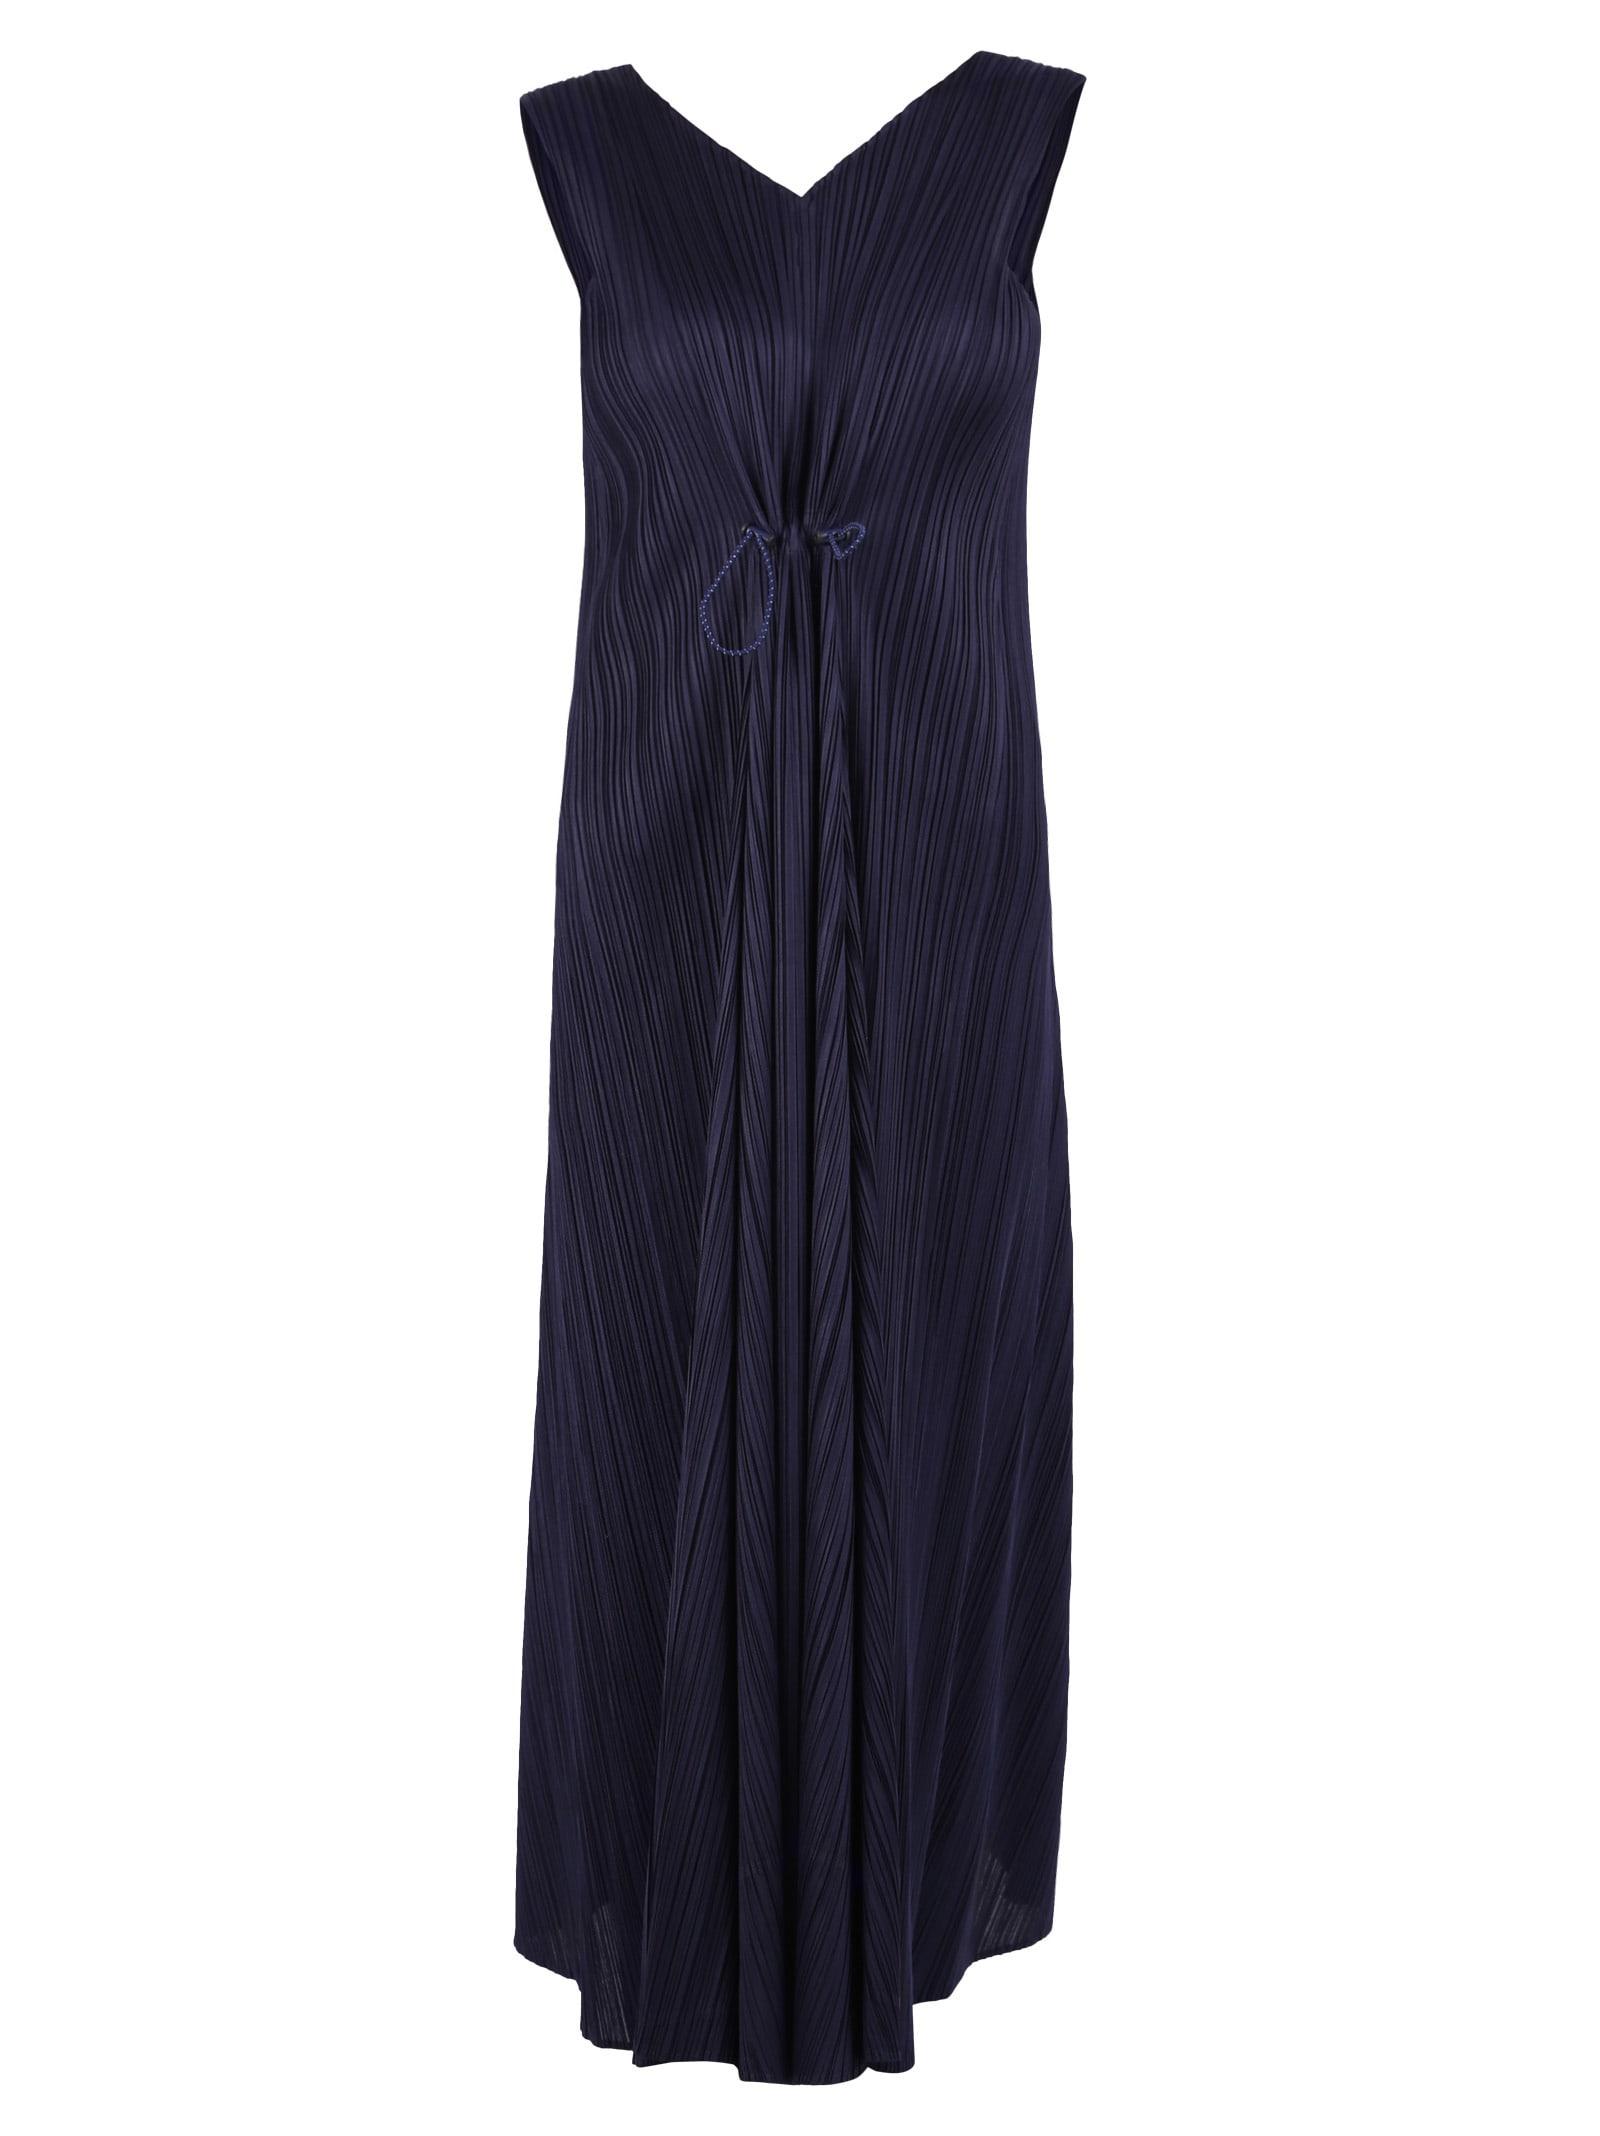 Buy Issey Miyake Sleeveless Dress online, shop Issey Miyake with free shipping